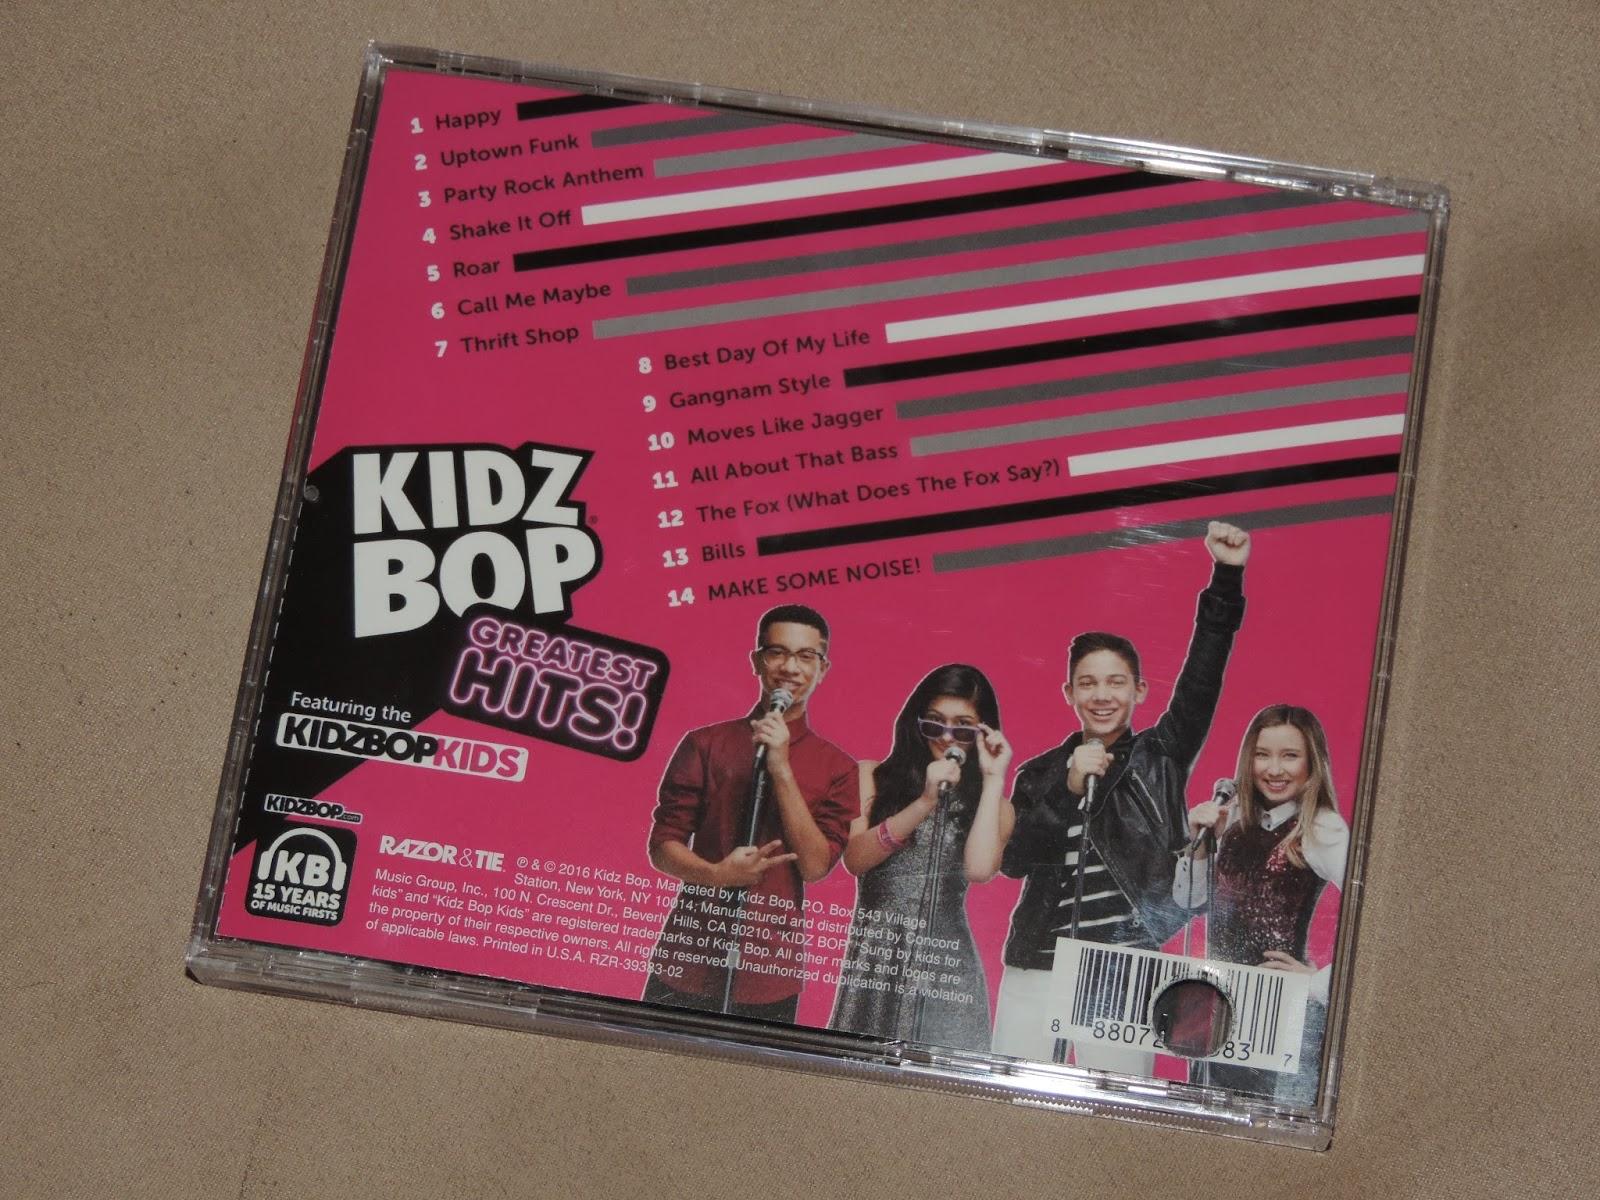 mail4rosey: kidz bop greatest hits cd & tour information!